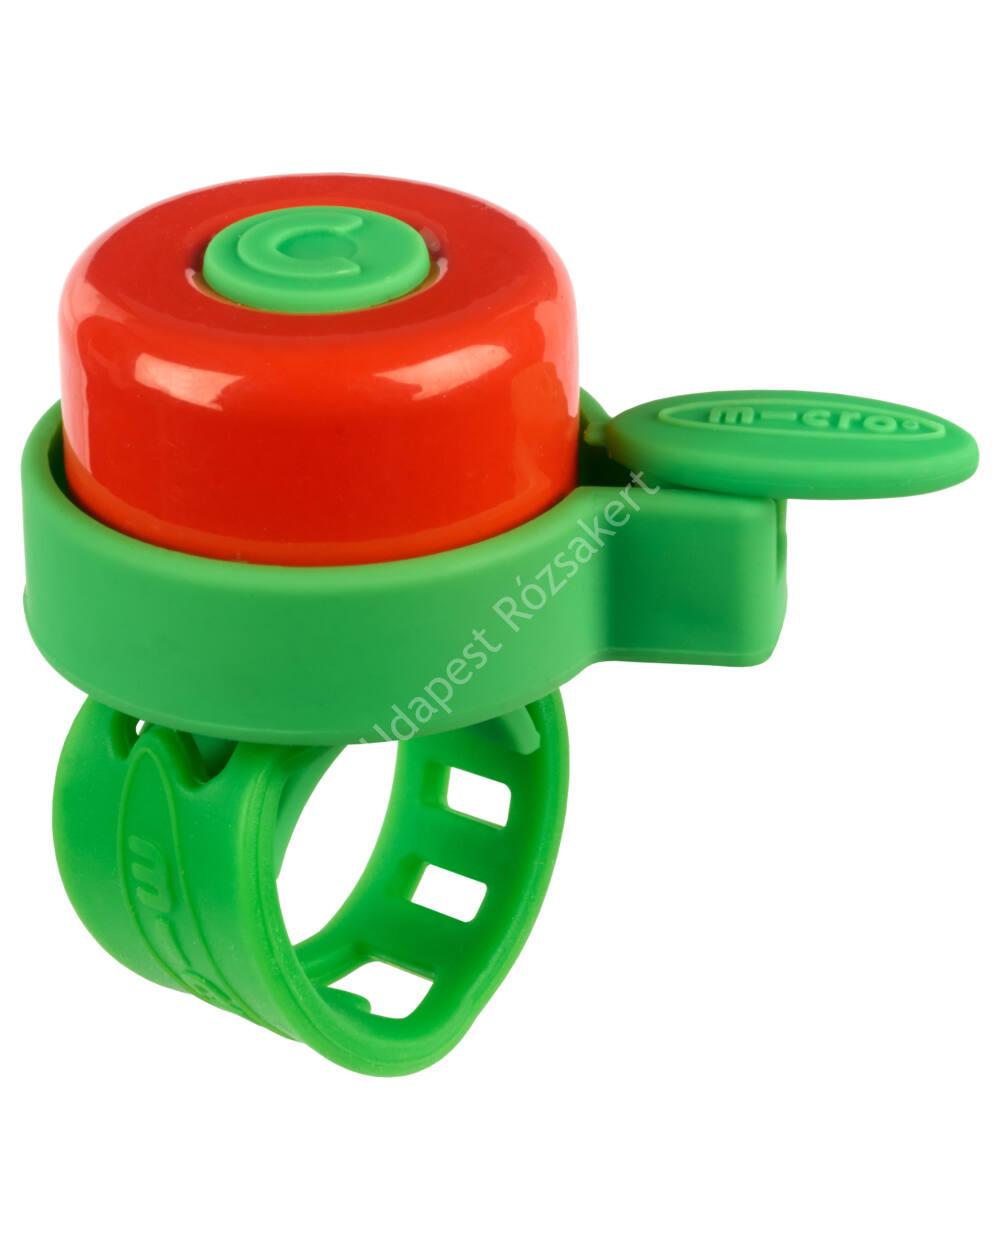 Micro roller csengő, zöld-piros